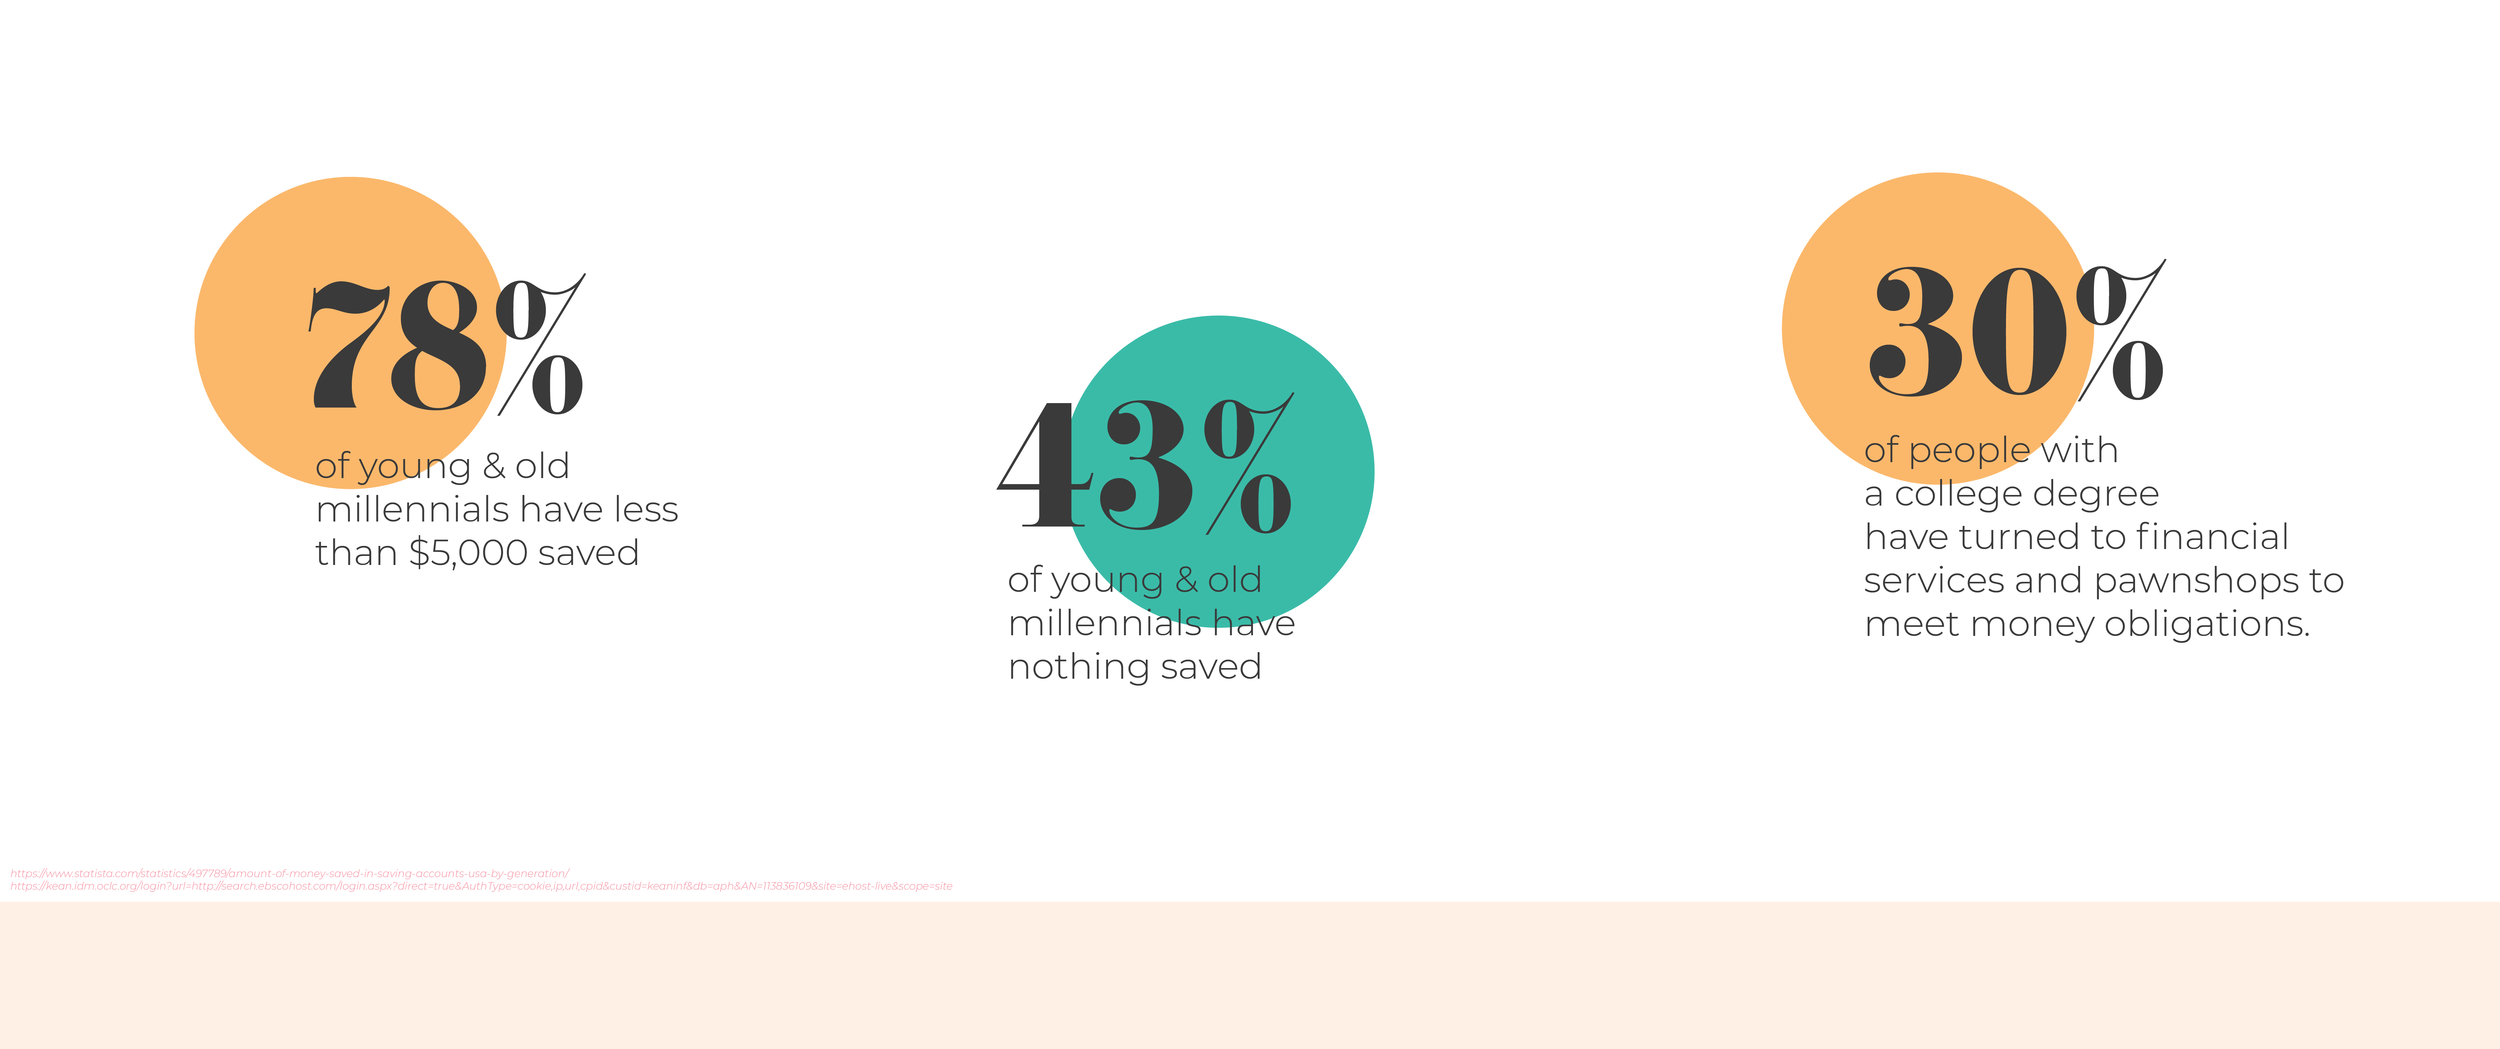 Moolah-Layout_02_Percentage.png